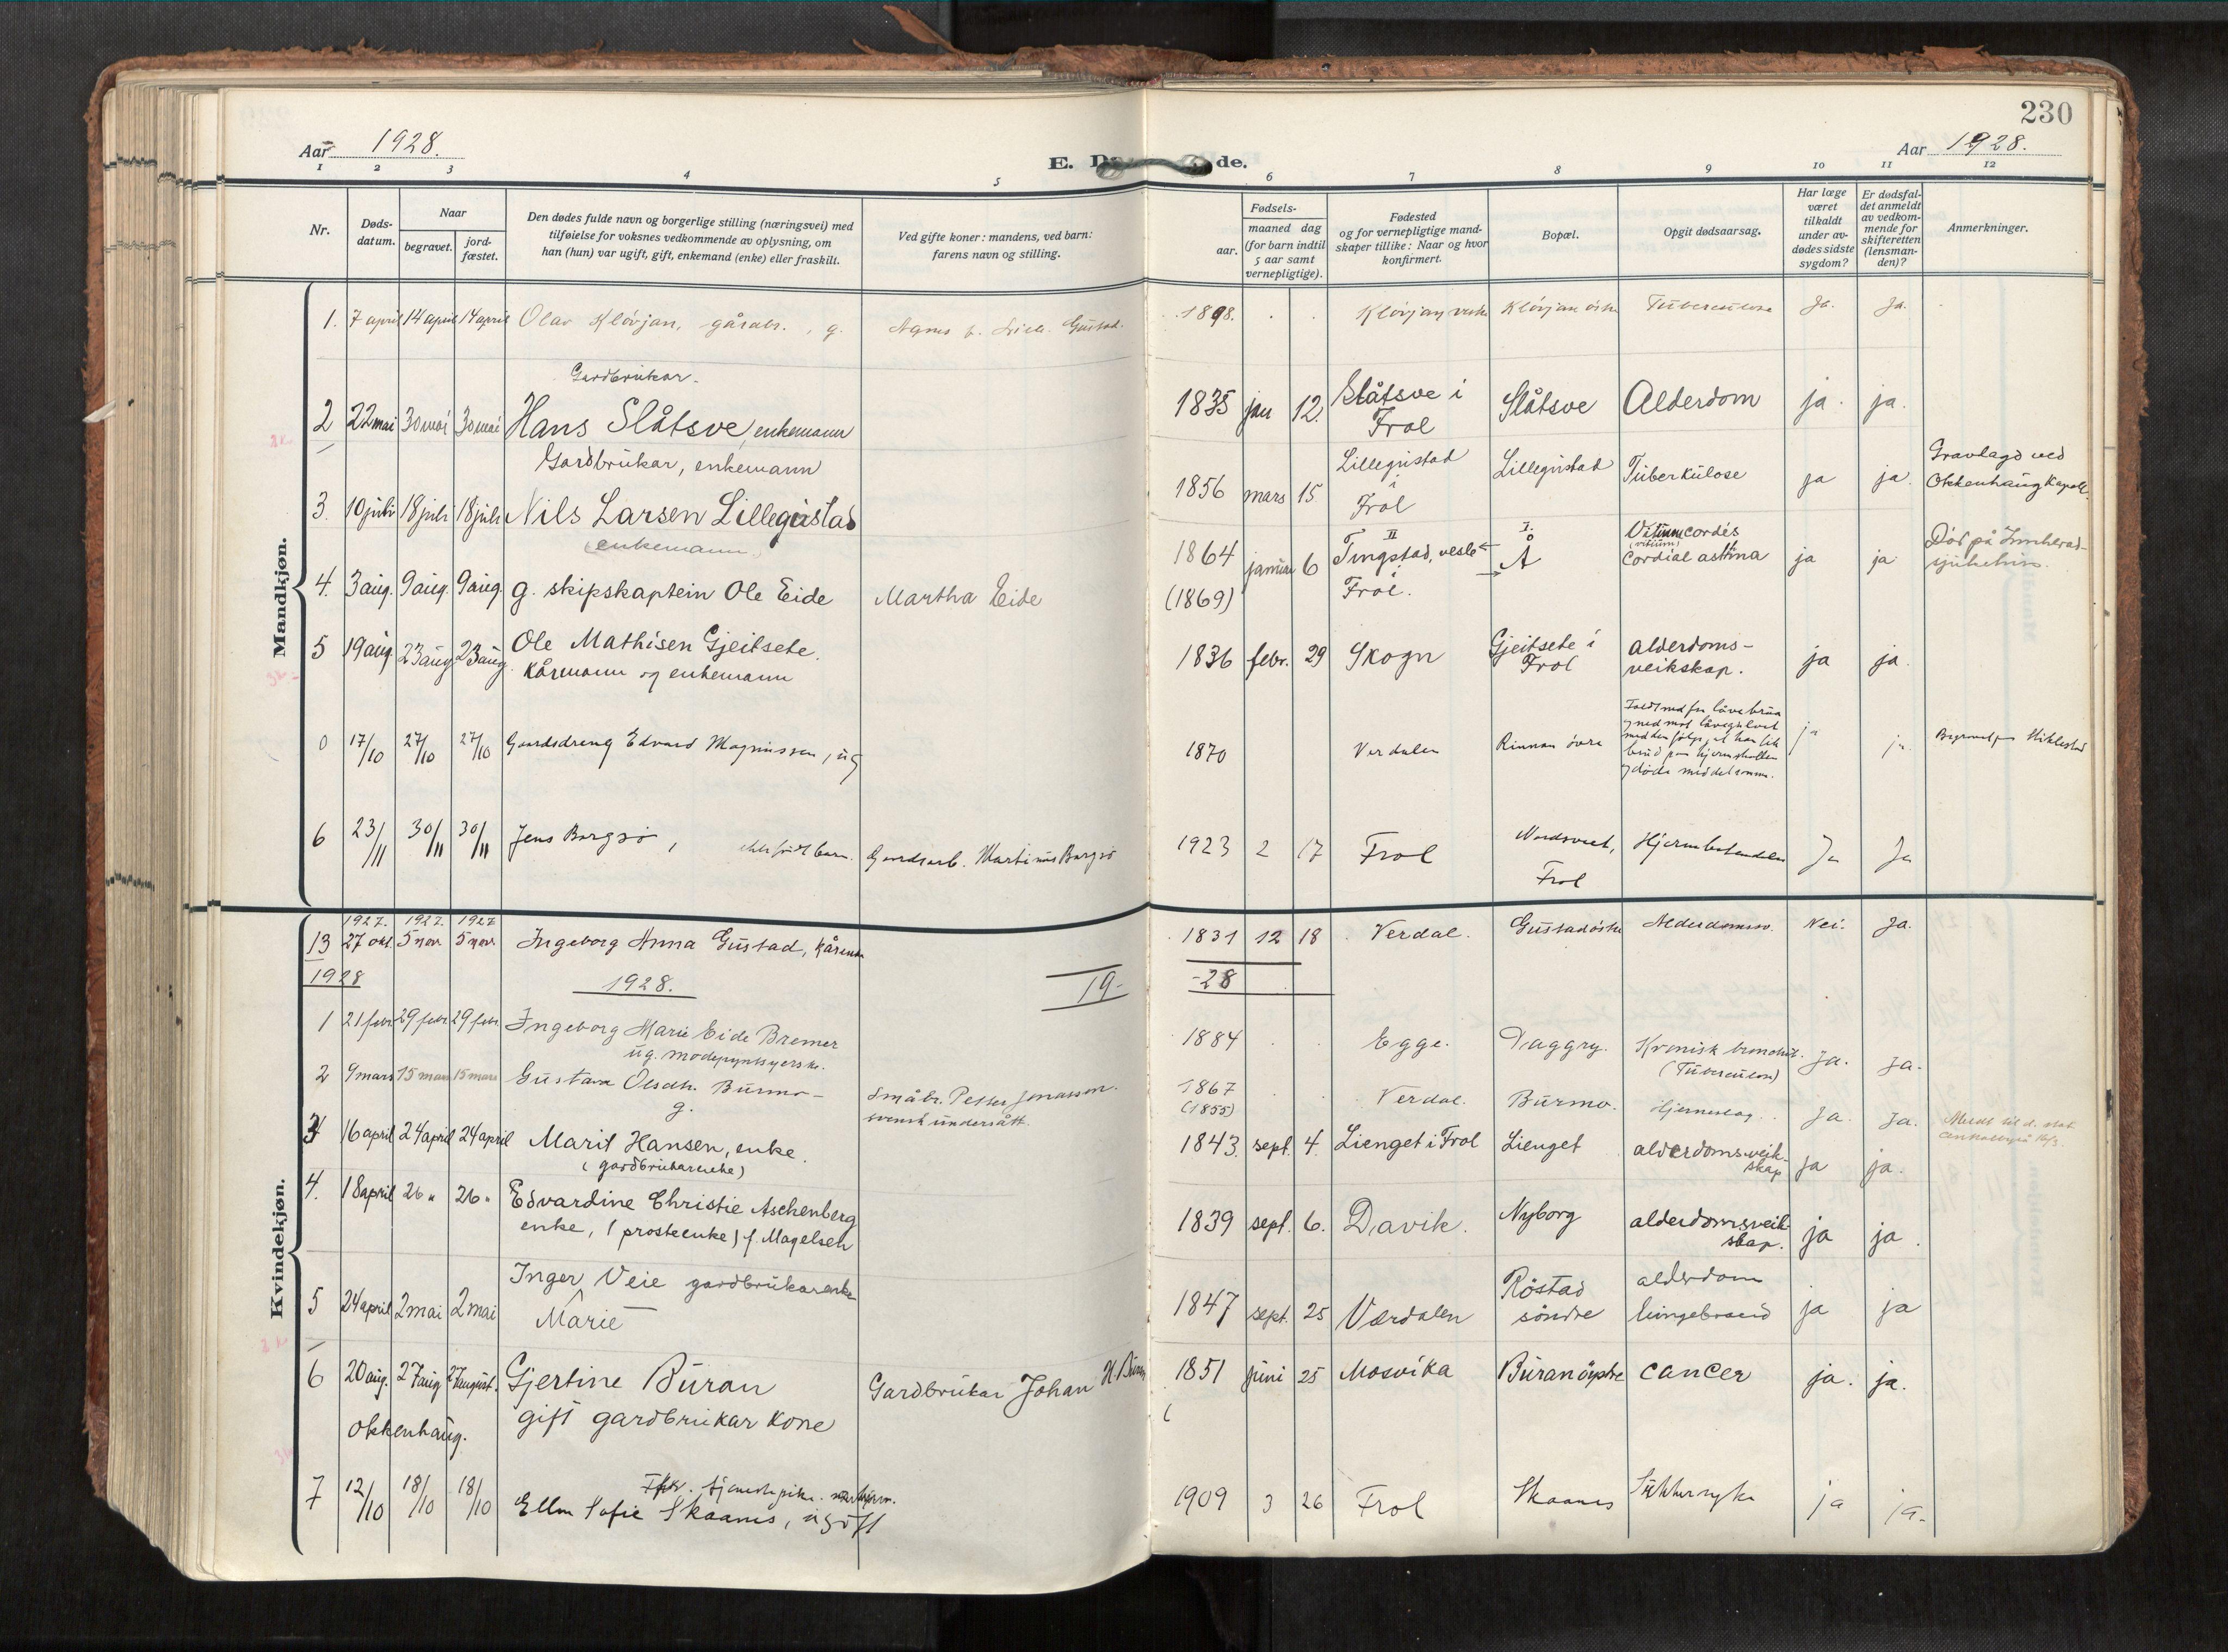 SAT, Levanger sokneprestkontor*, Parish register (official) no. 1, 1912-1935, p. 230